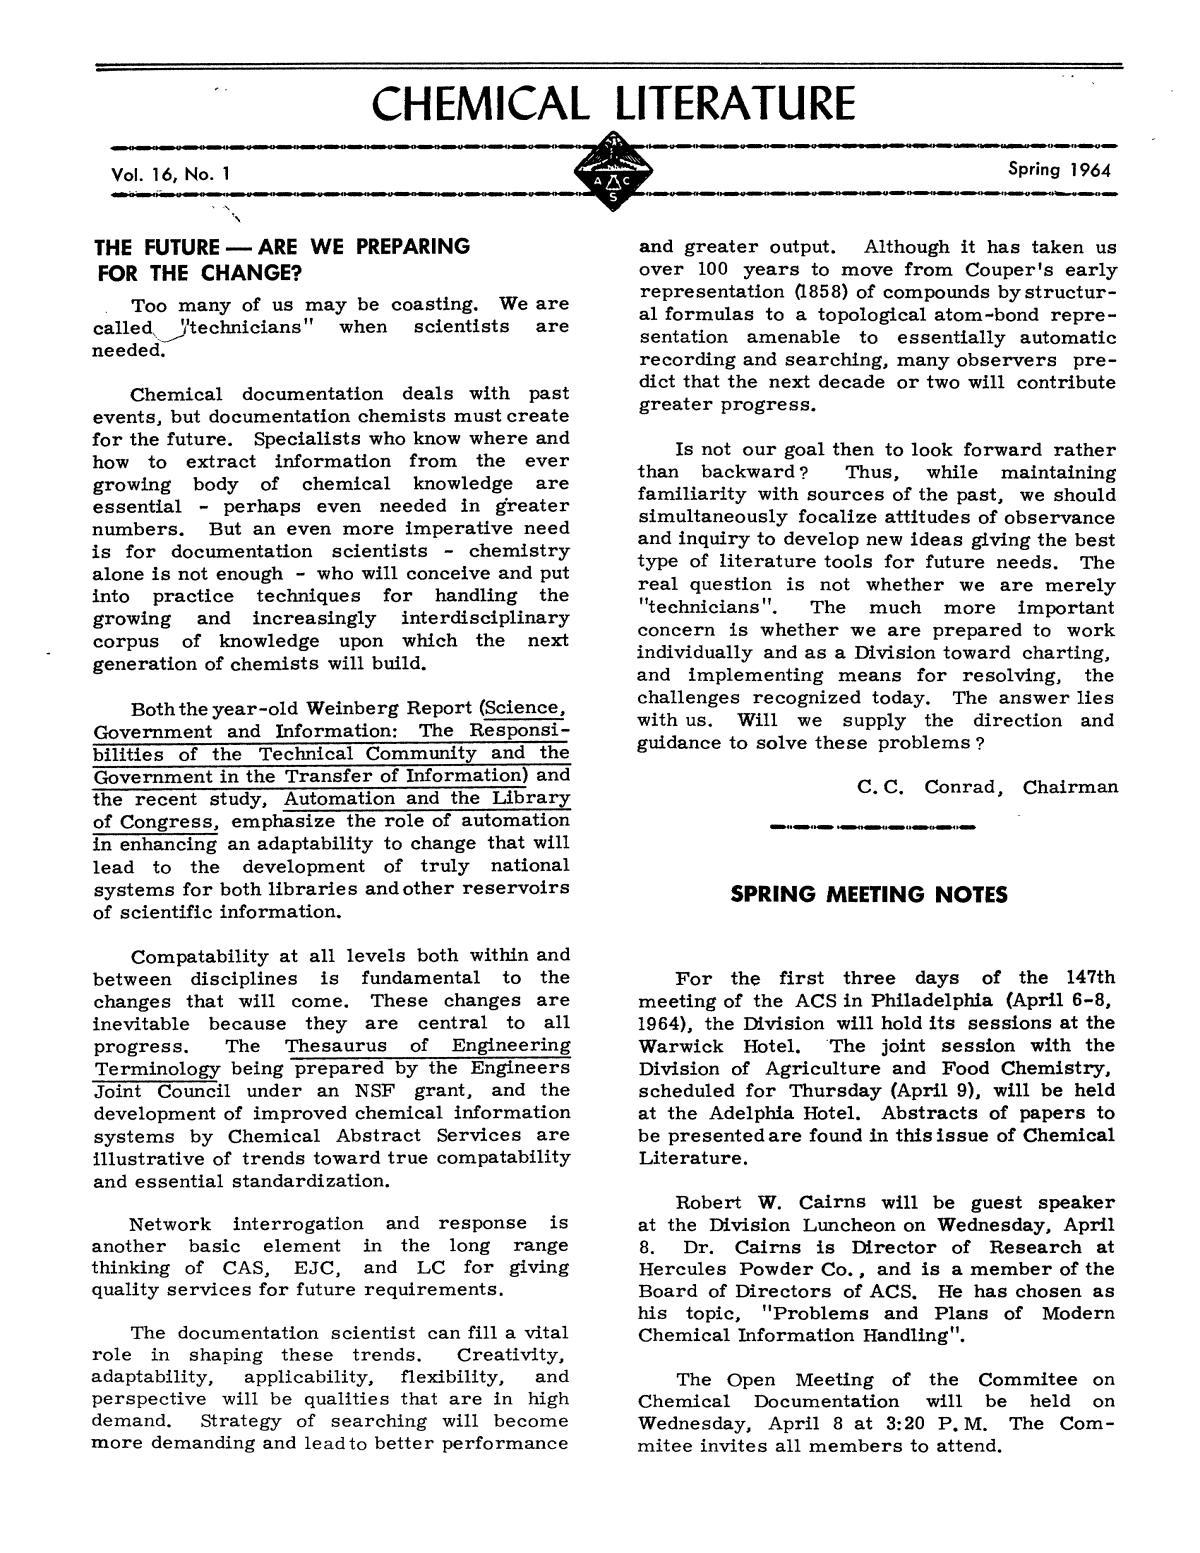 Chemical Literature, Volume 16, Number 1, Spring 1964 - Digital Library